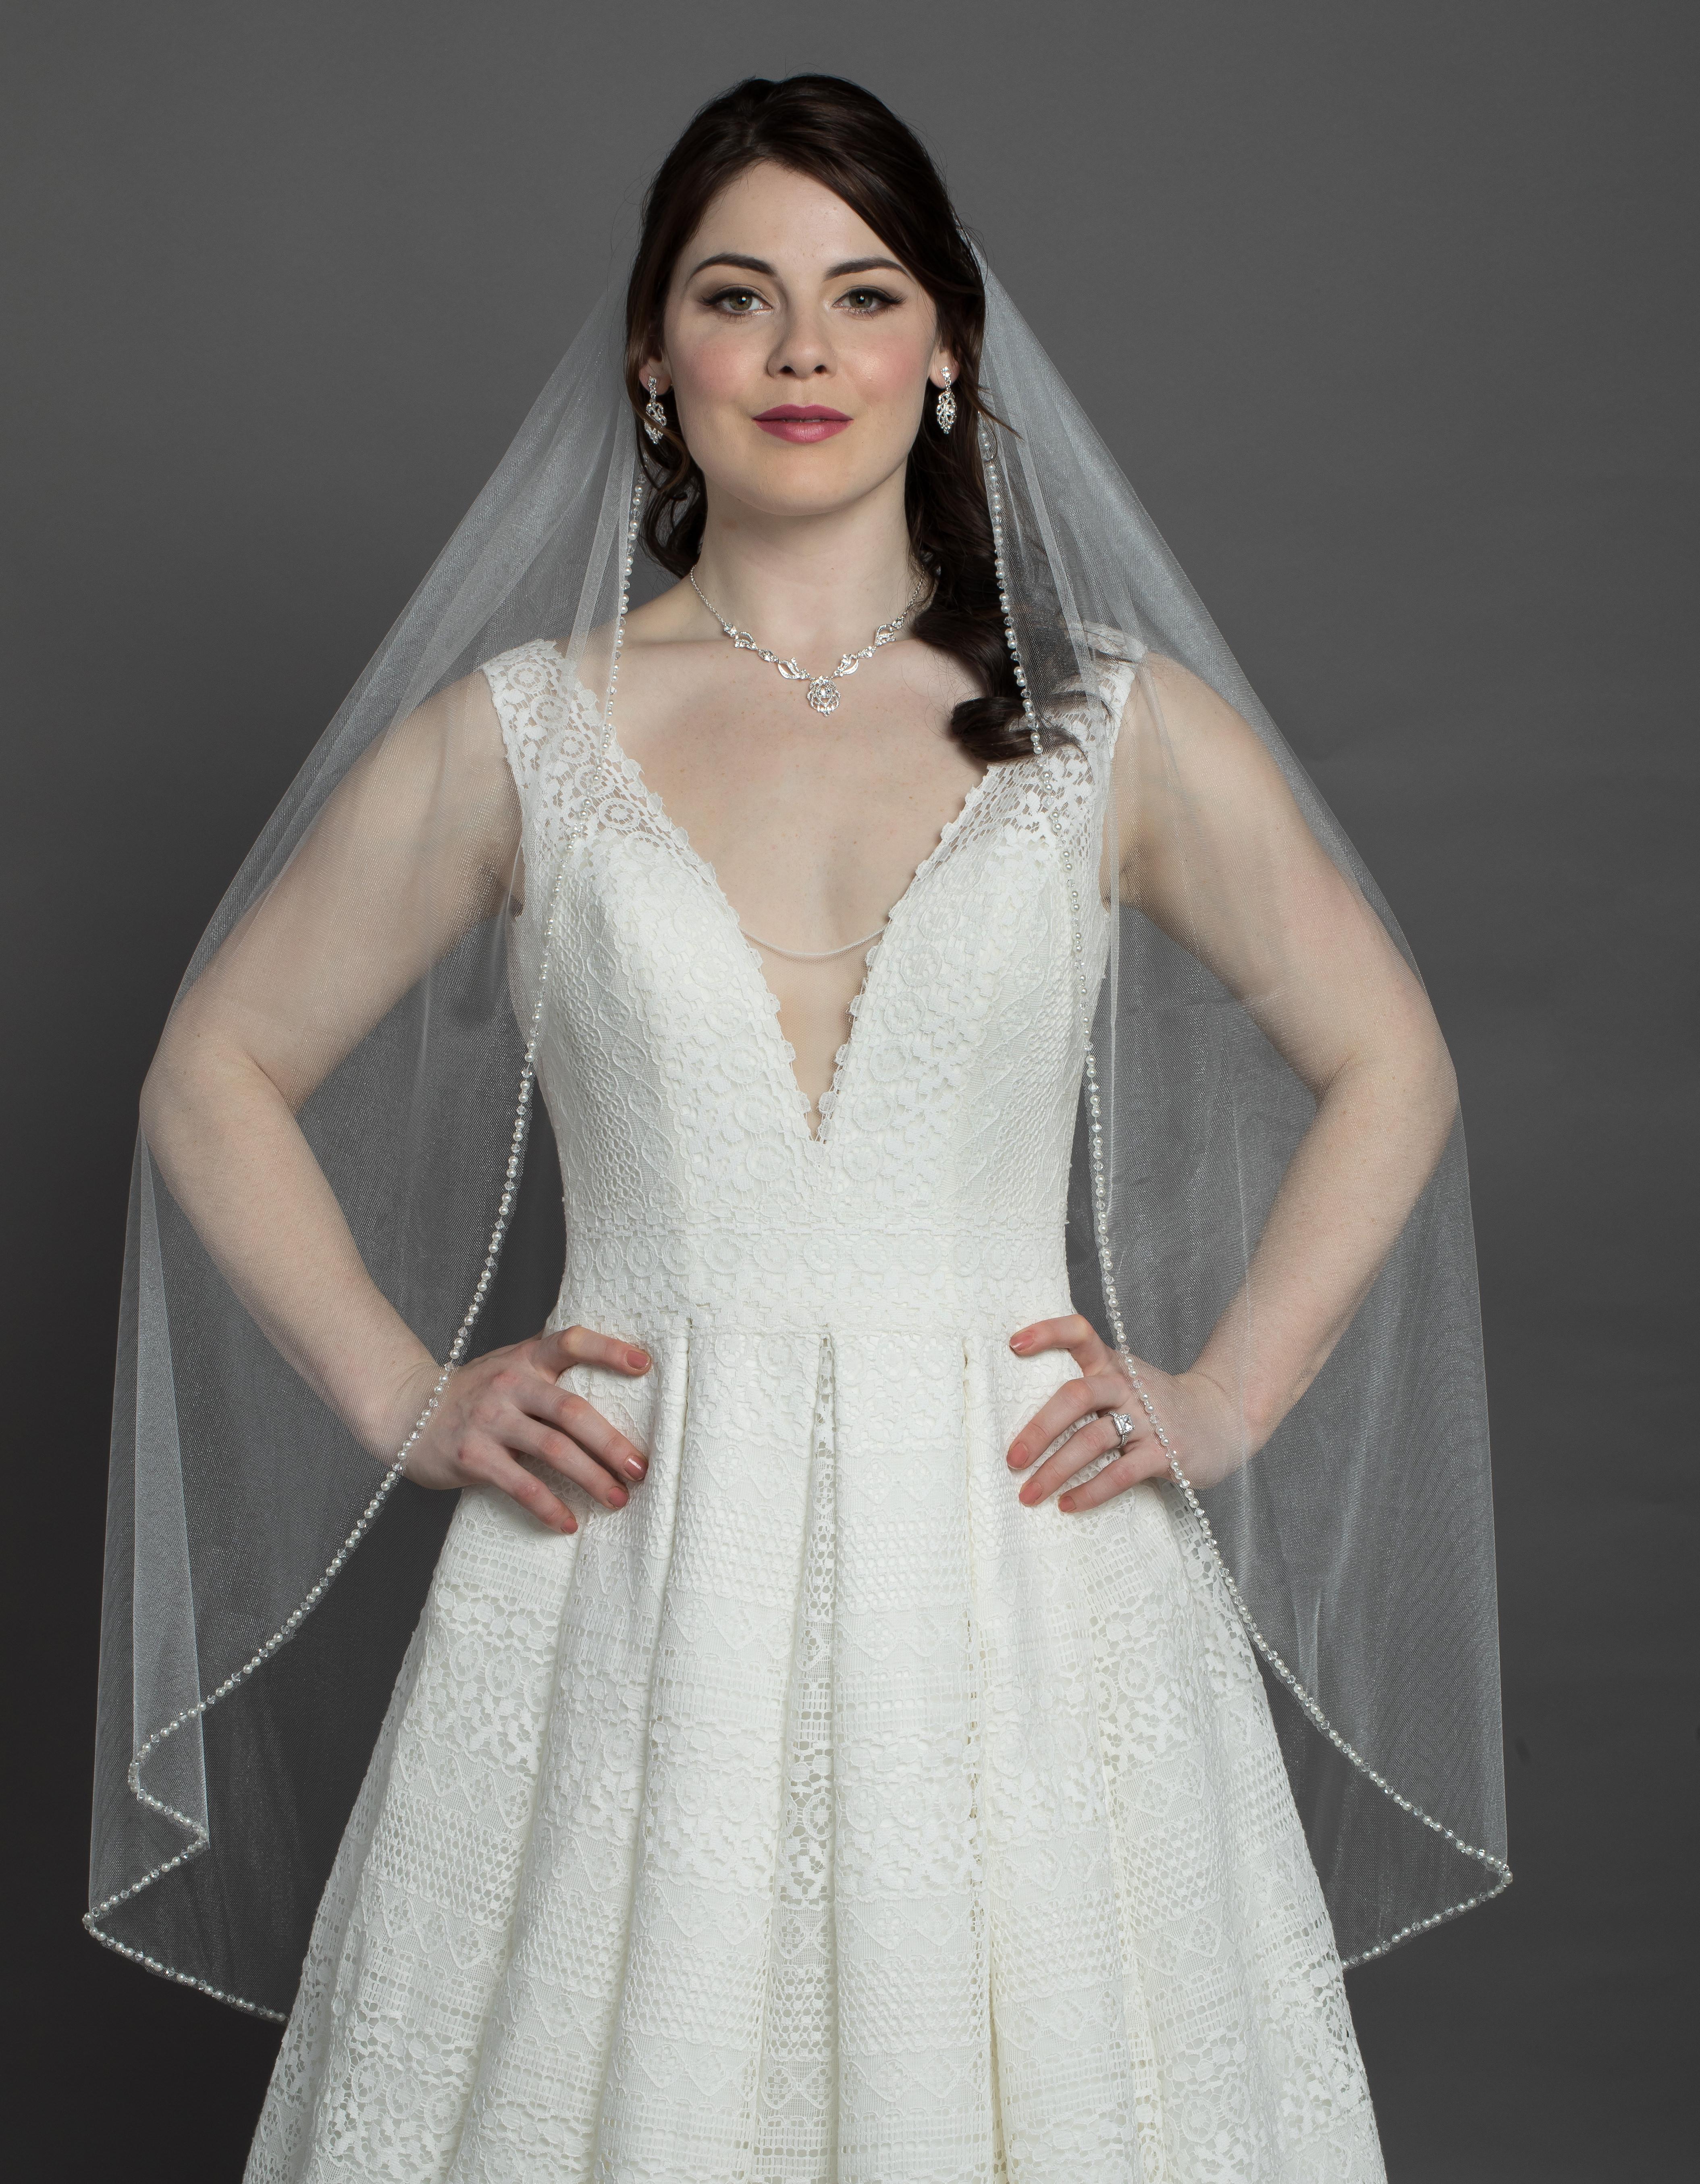 Bridal Classics Marquise Veil Collection MV-2469